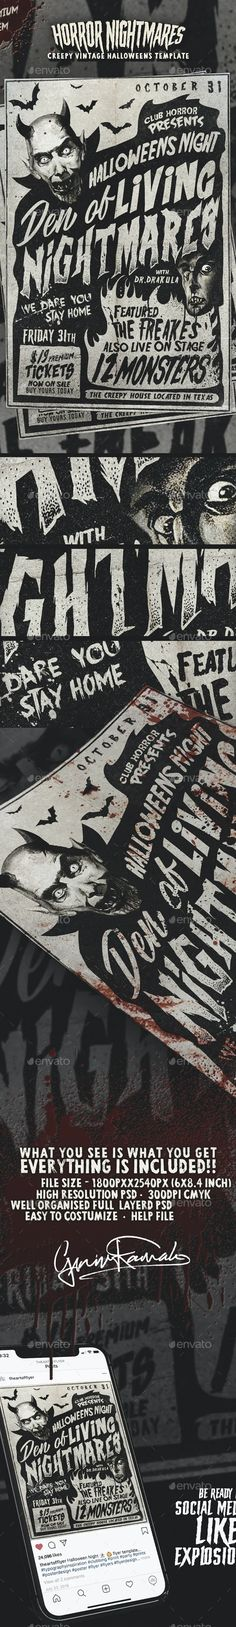 Horror Nightmares - Vintage Halloween Poster by yaniv-k | GraphicRiver